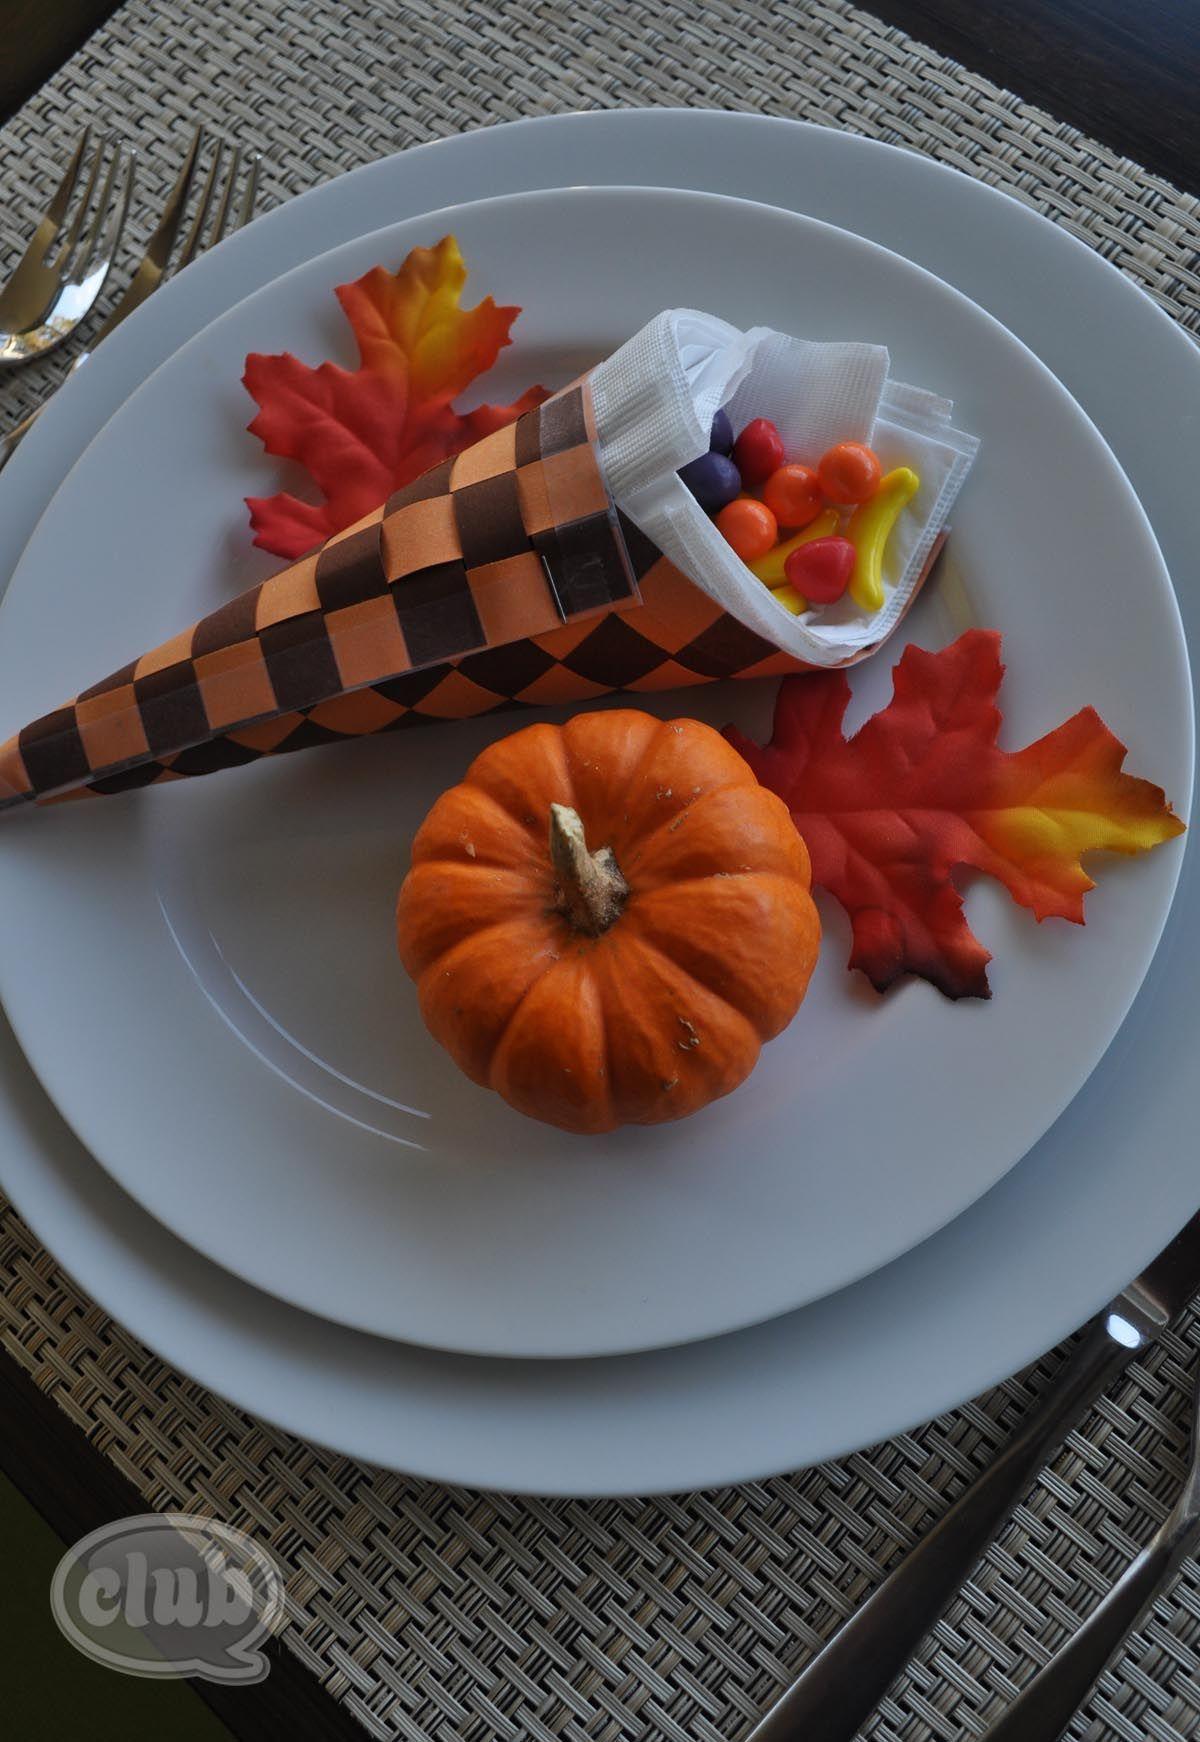 cute table setting - weaved paper cornucopia stuffed w/napkins and runts